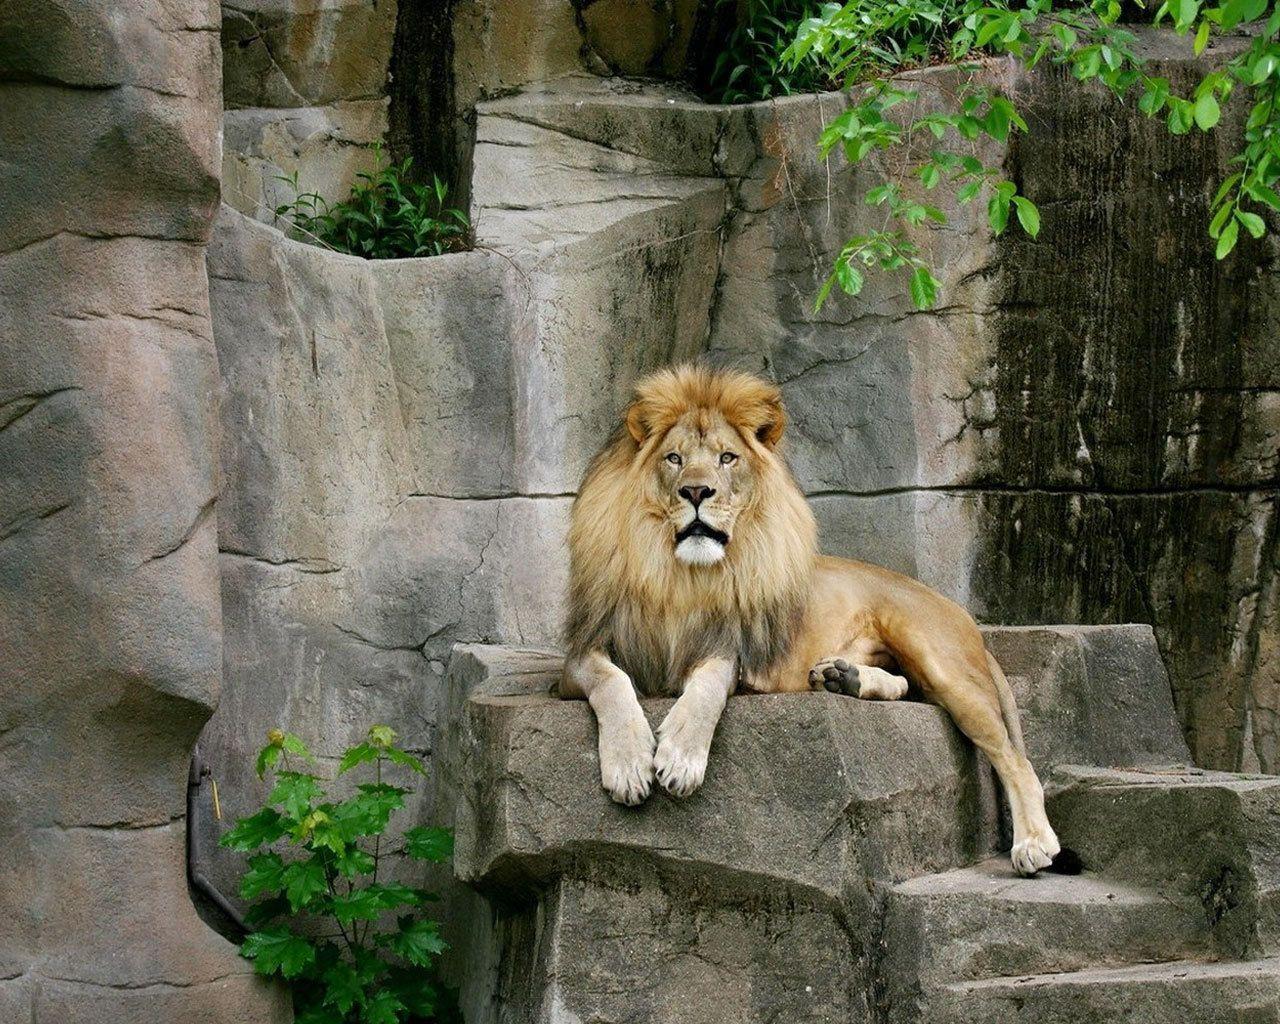 Wild-animal-lion-wallpaper-HD